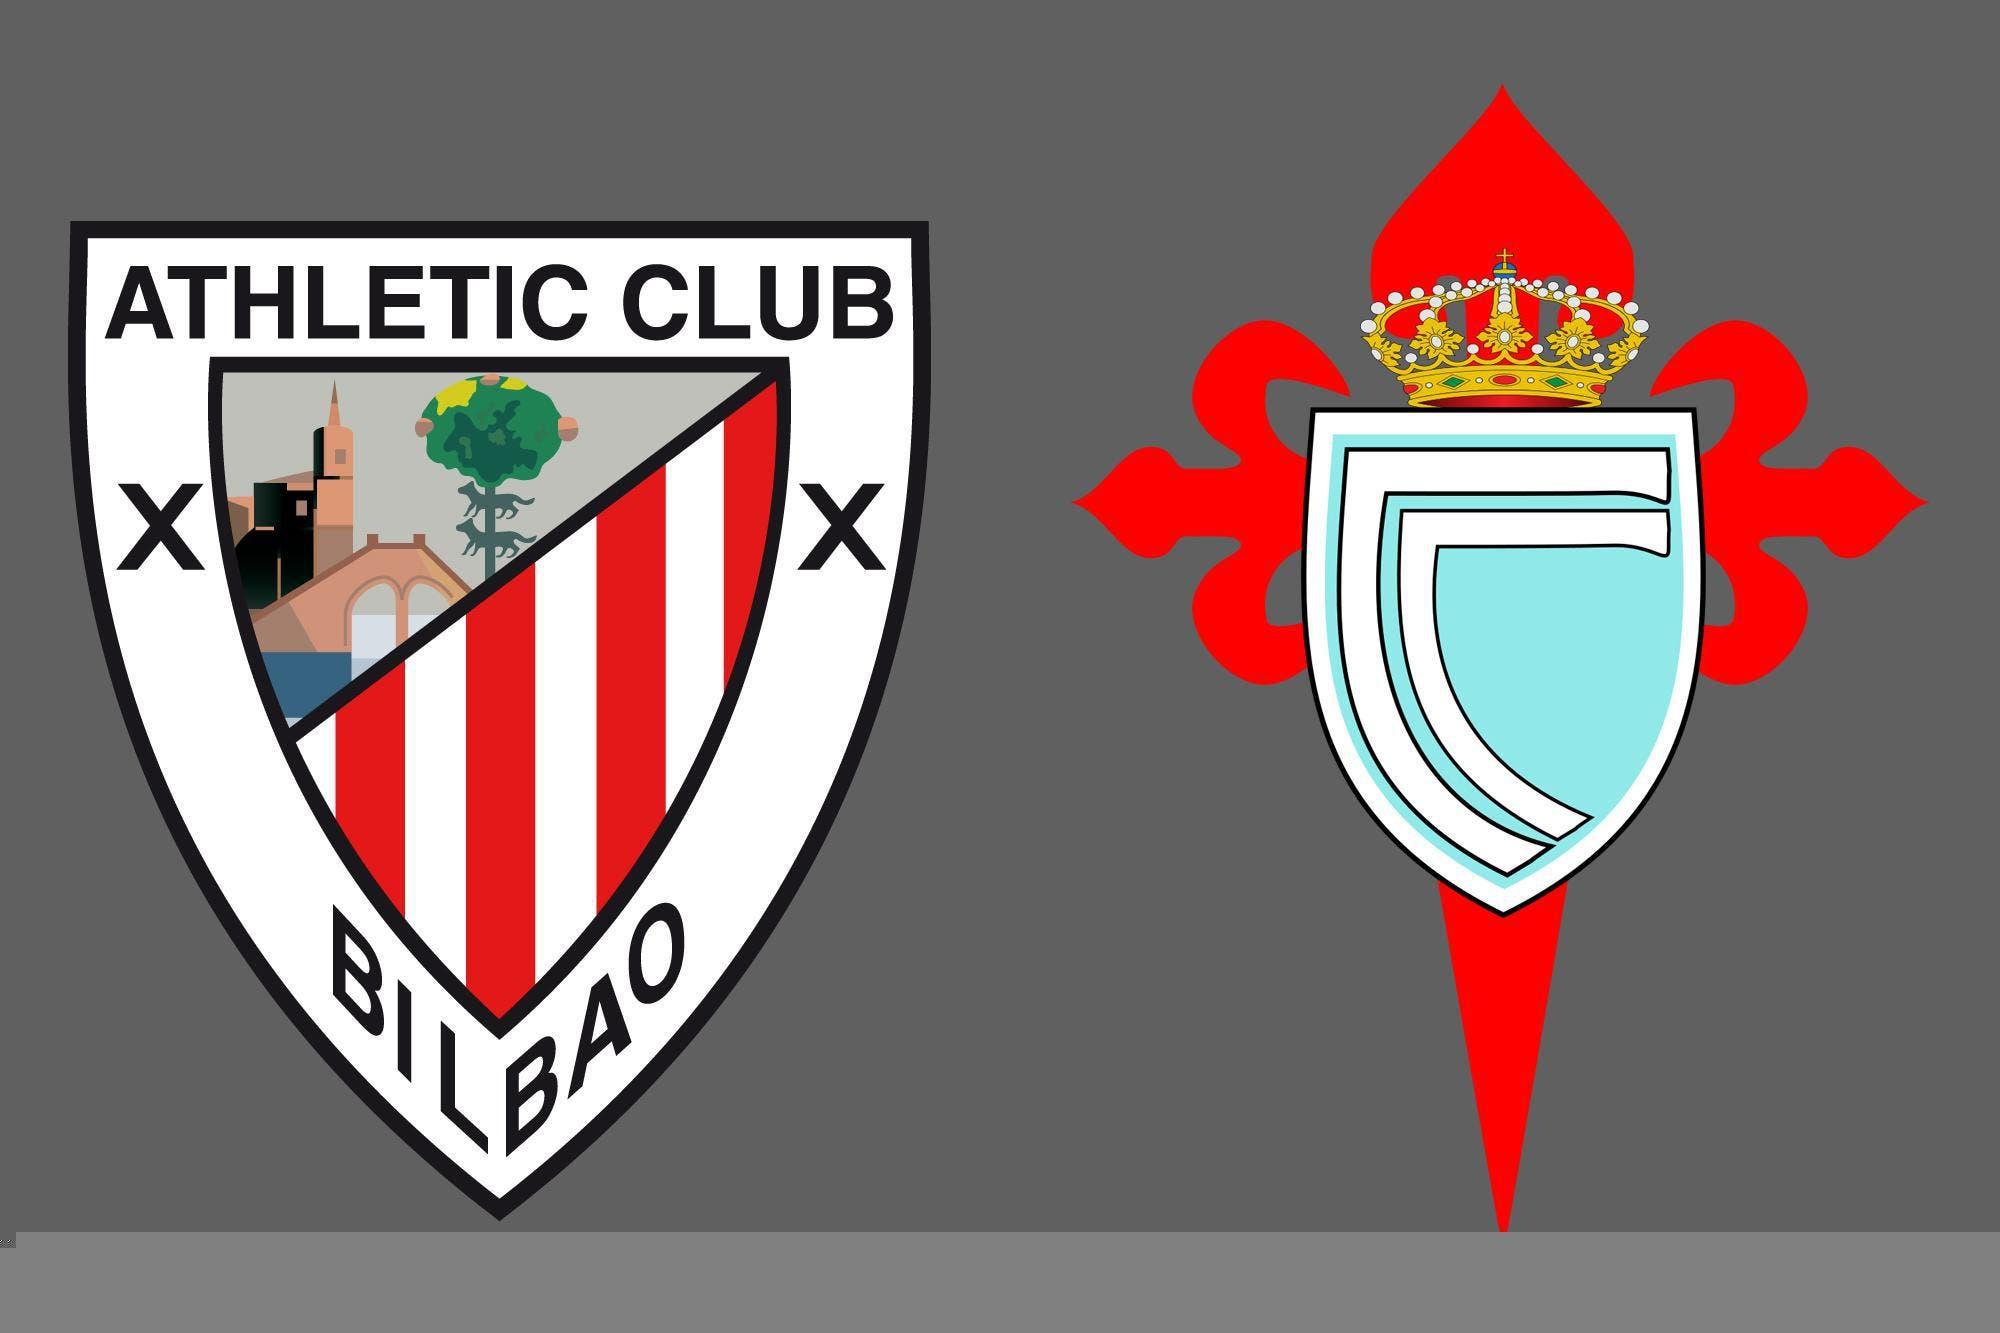 Liga de España: Celta venció por 2-0 a Athletic Club de Bilbao como visitante